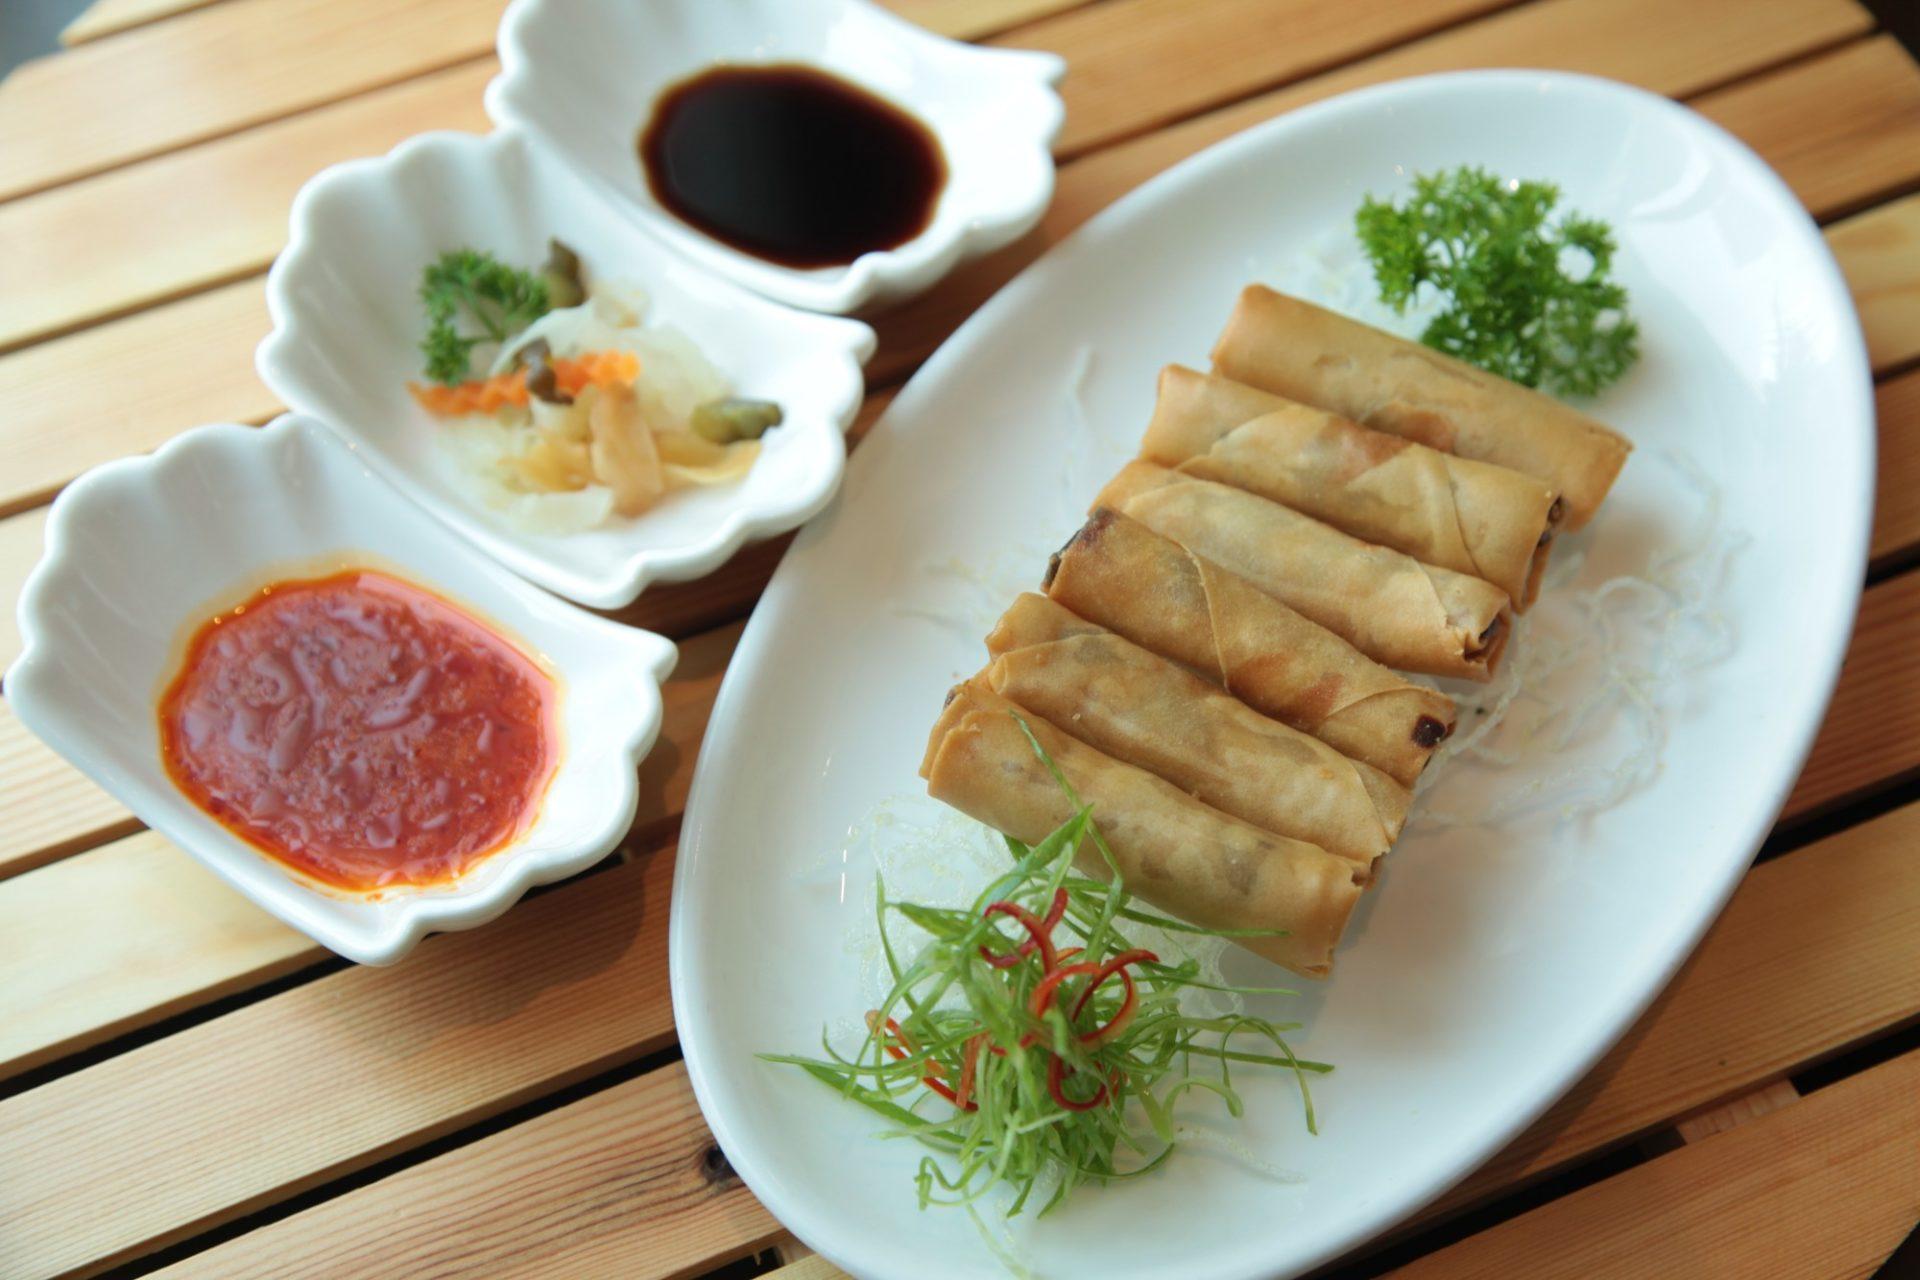 Springtime Appetizers: Top 2 Thai Spring Roll Recipes in Thai Restaurants